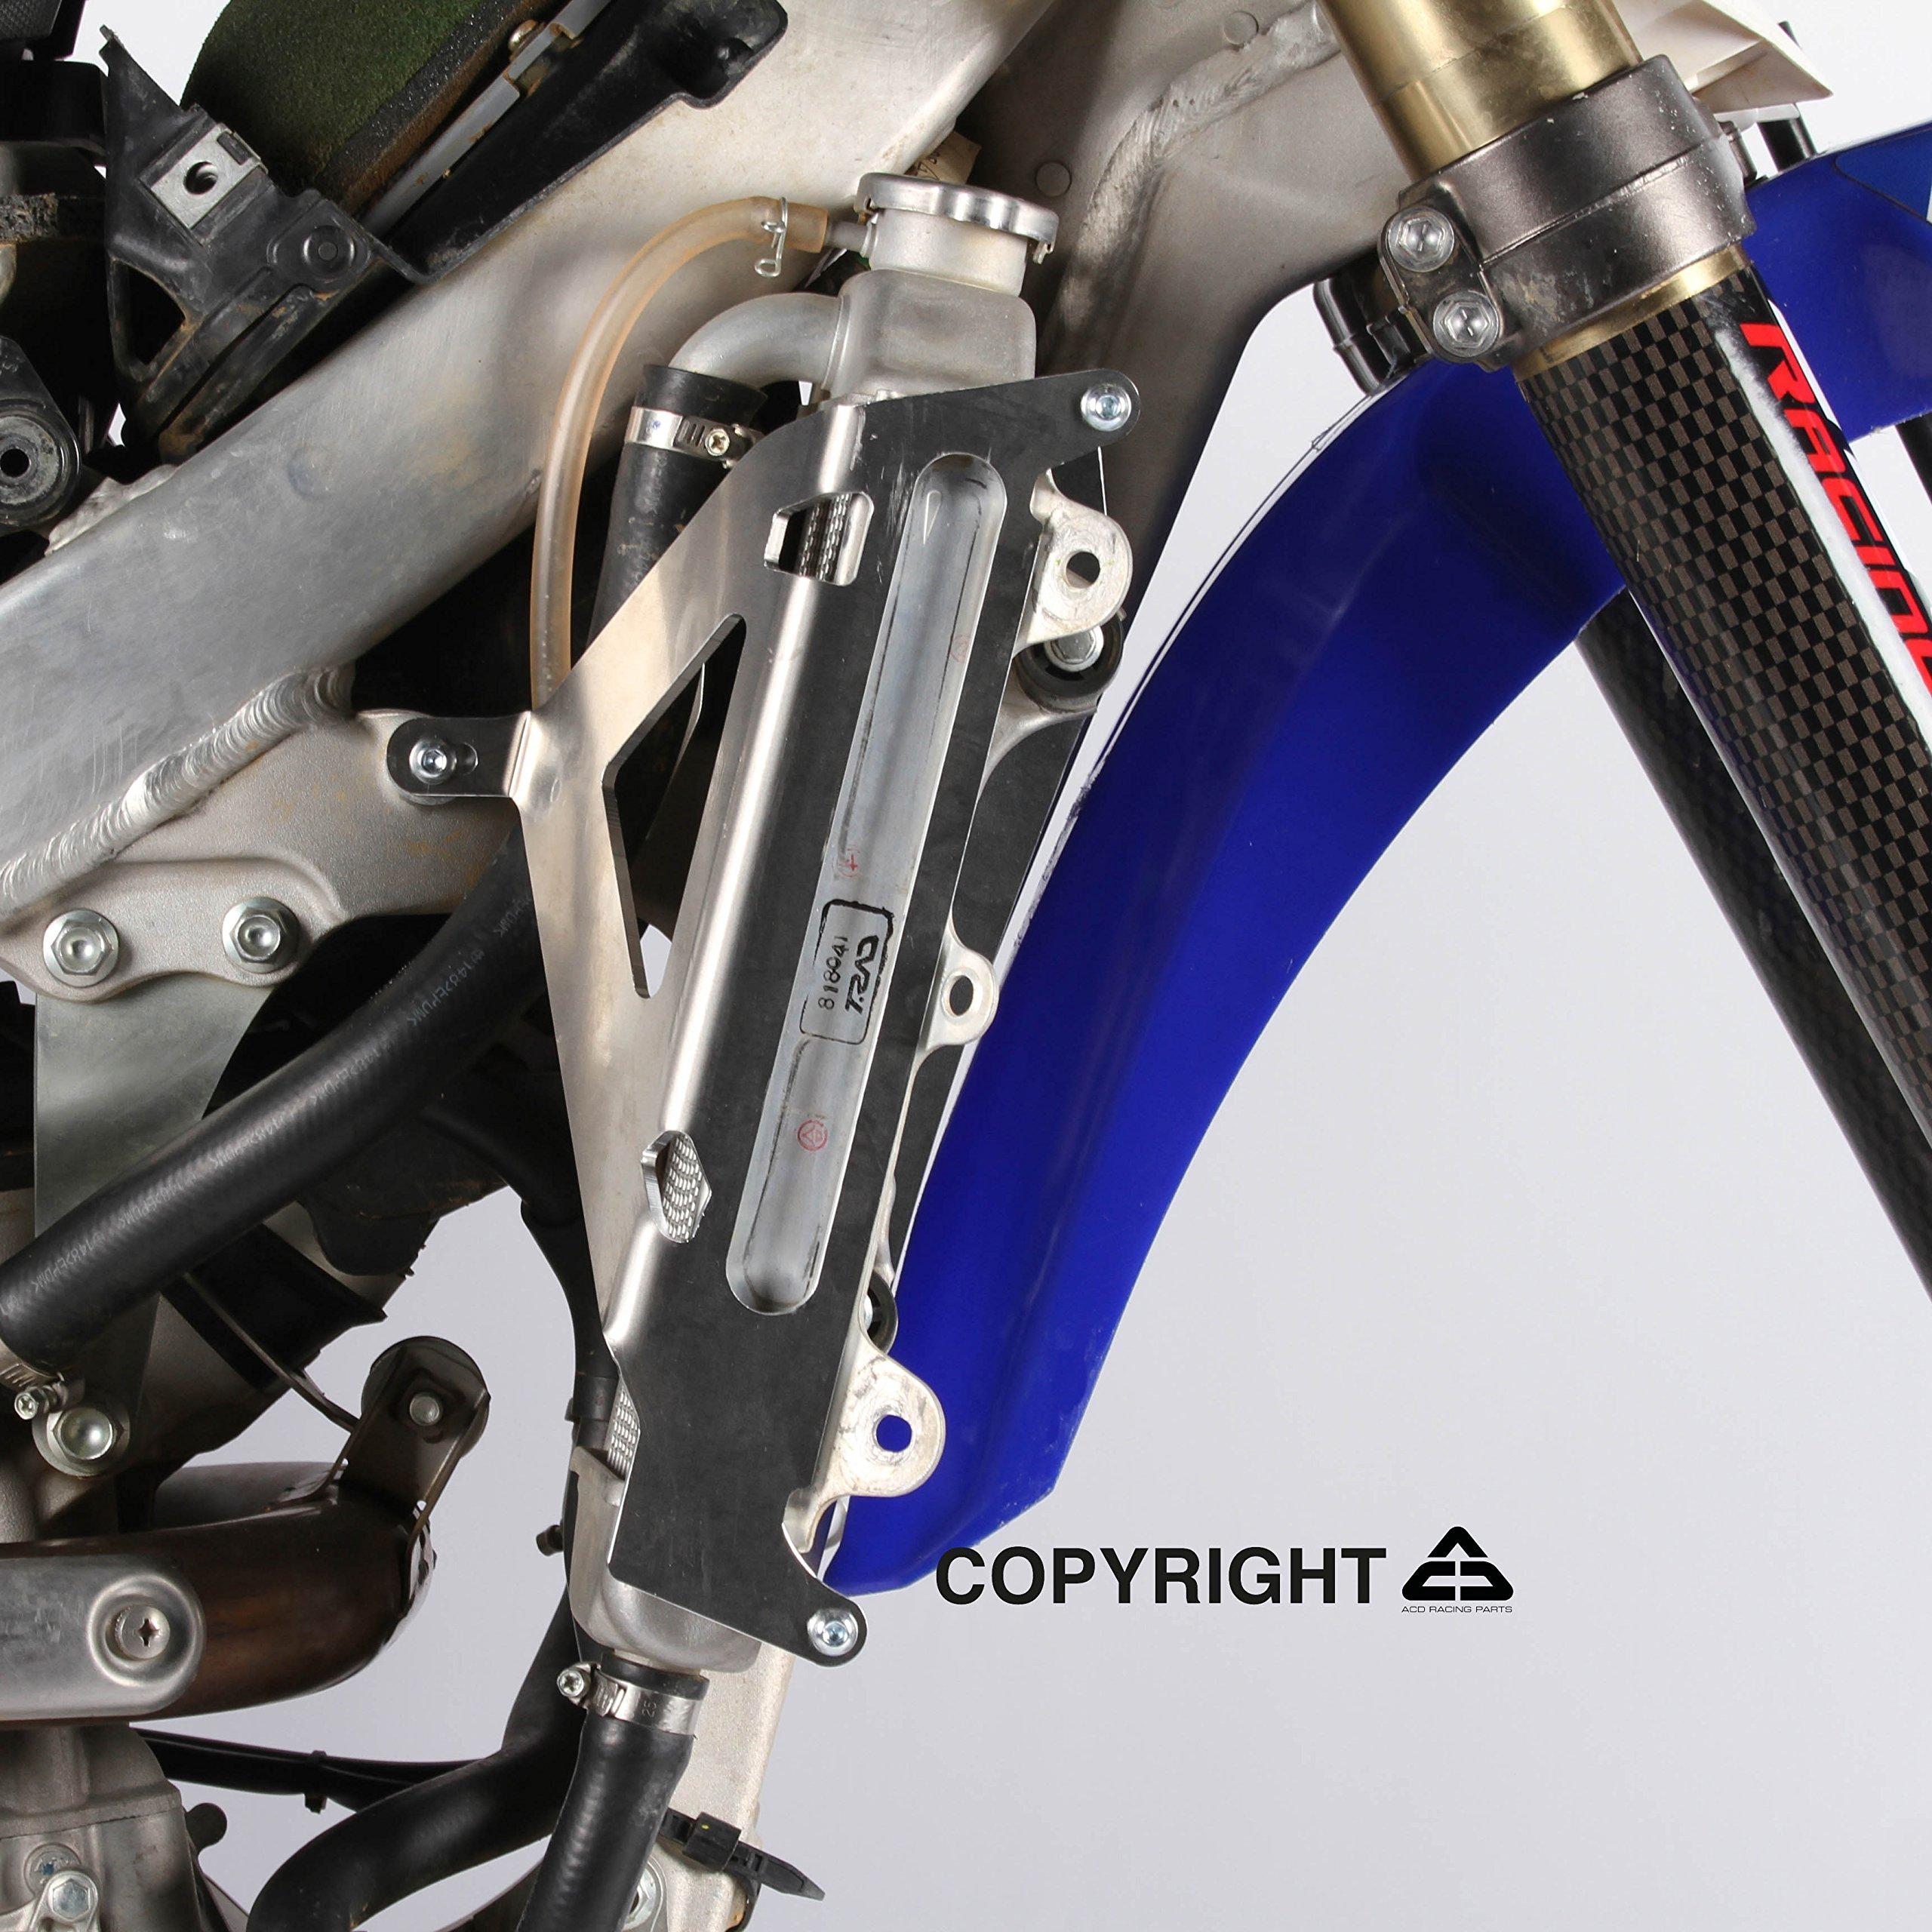 Radiator Guards Yamaha YZ250F 2014-2017 — YZ 250 F Protection Braces ACD